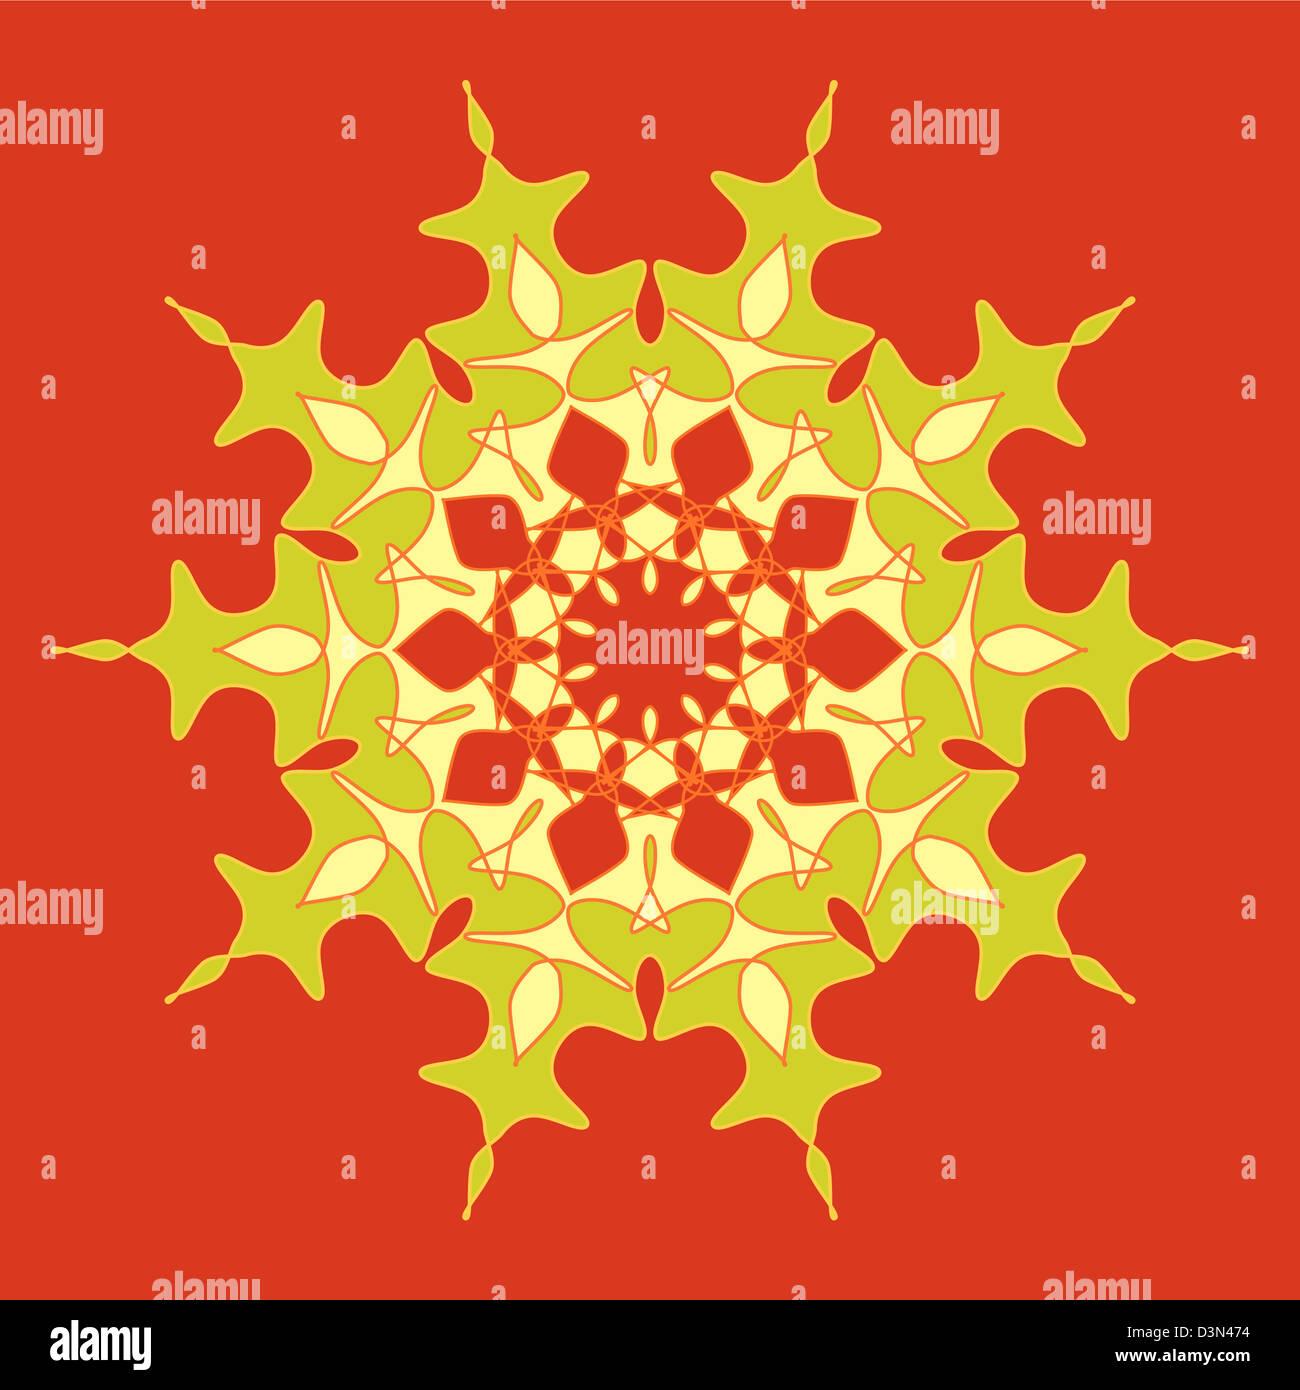 Artistic and colorful ornamental design Stock Photo